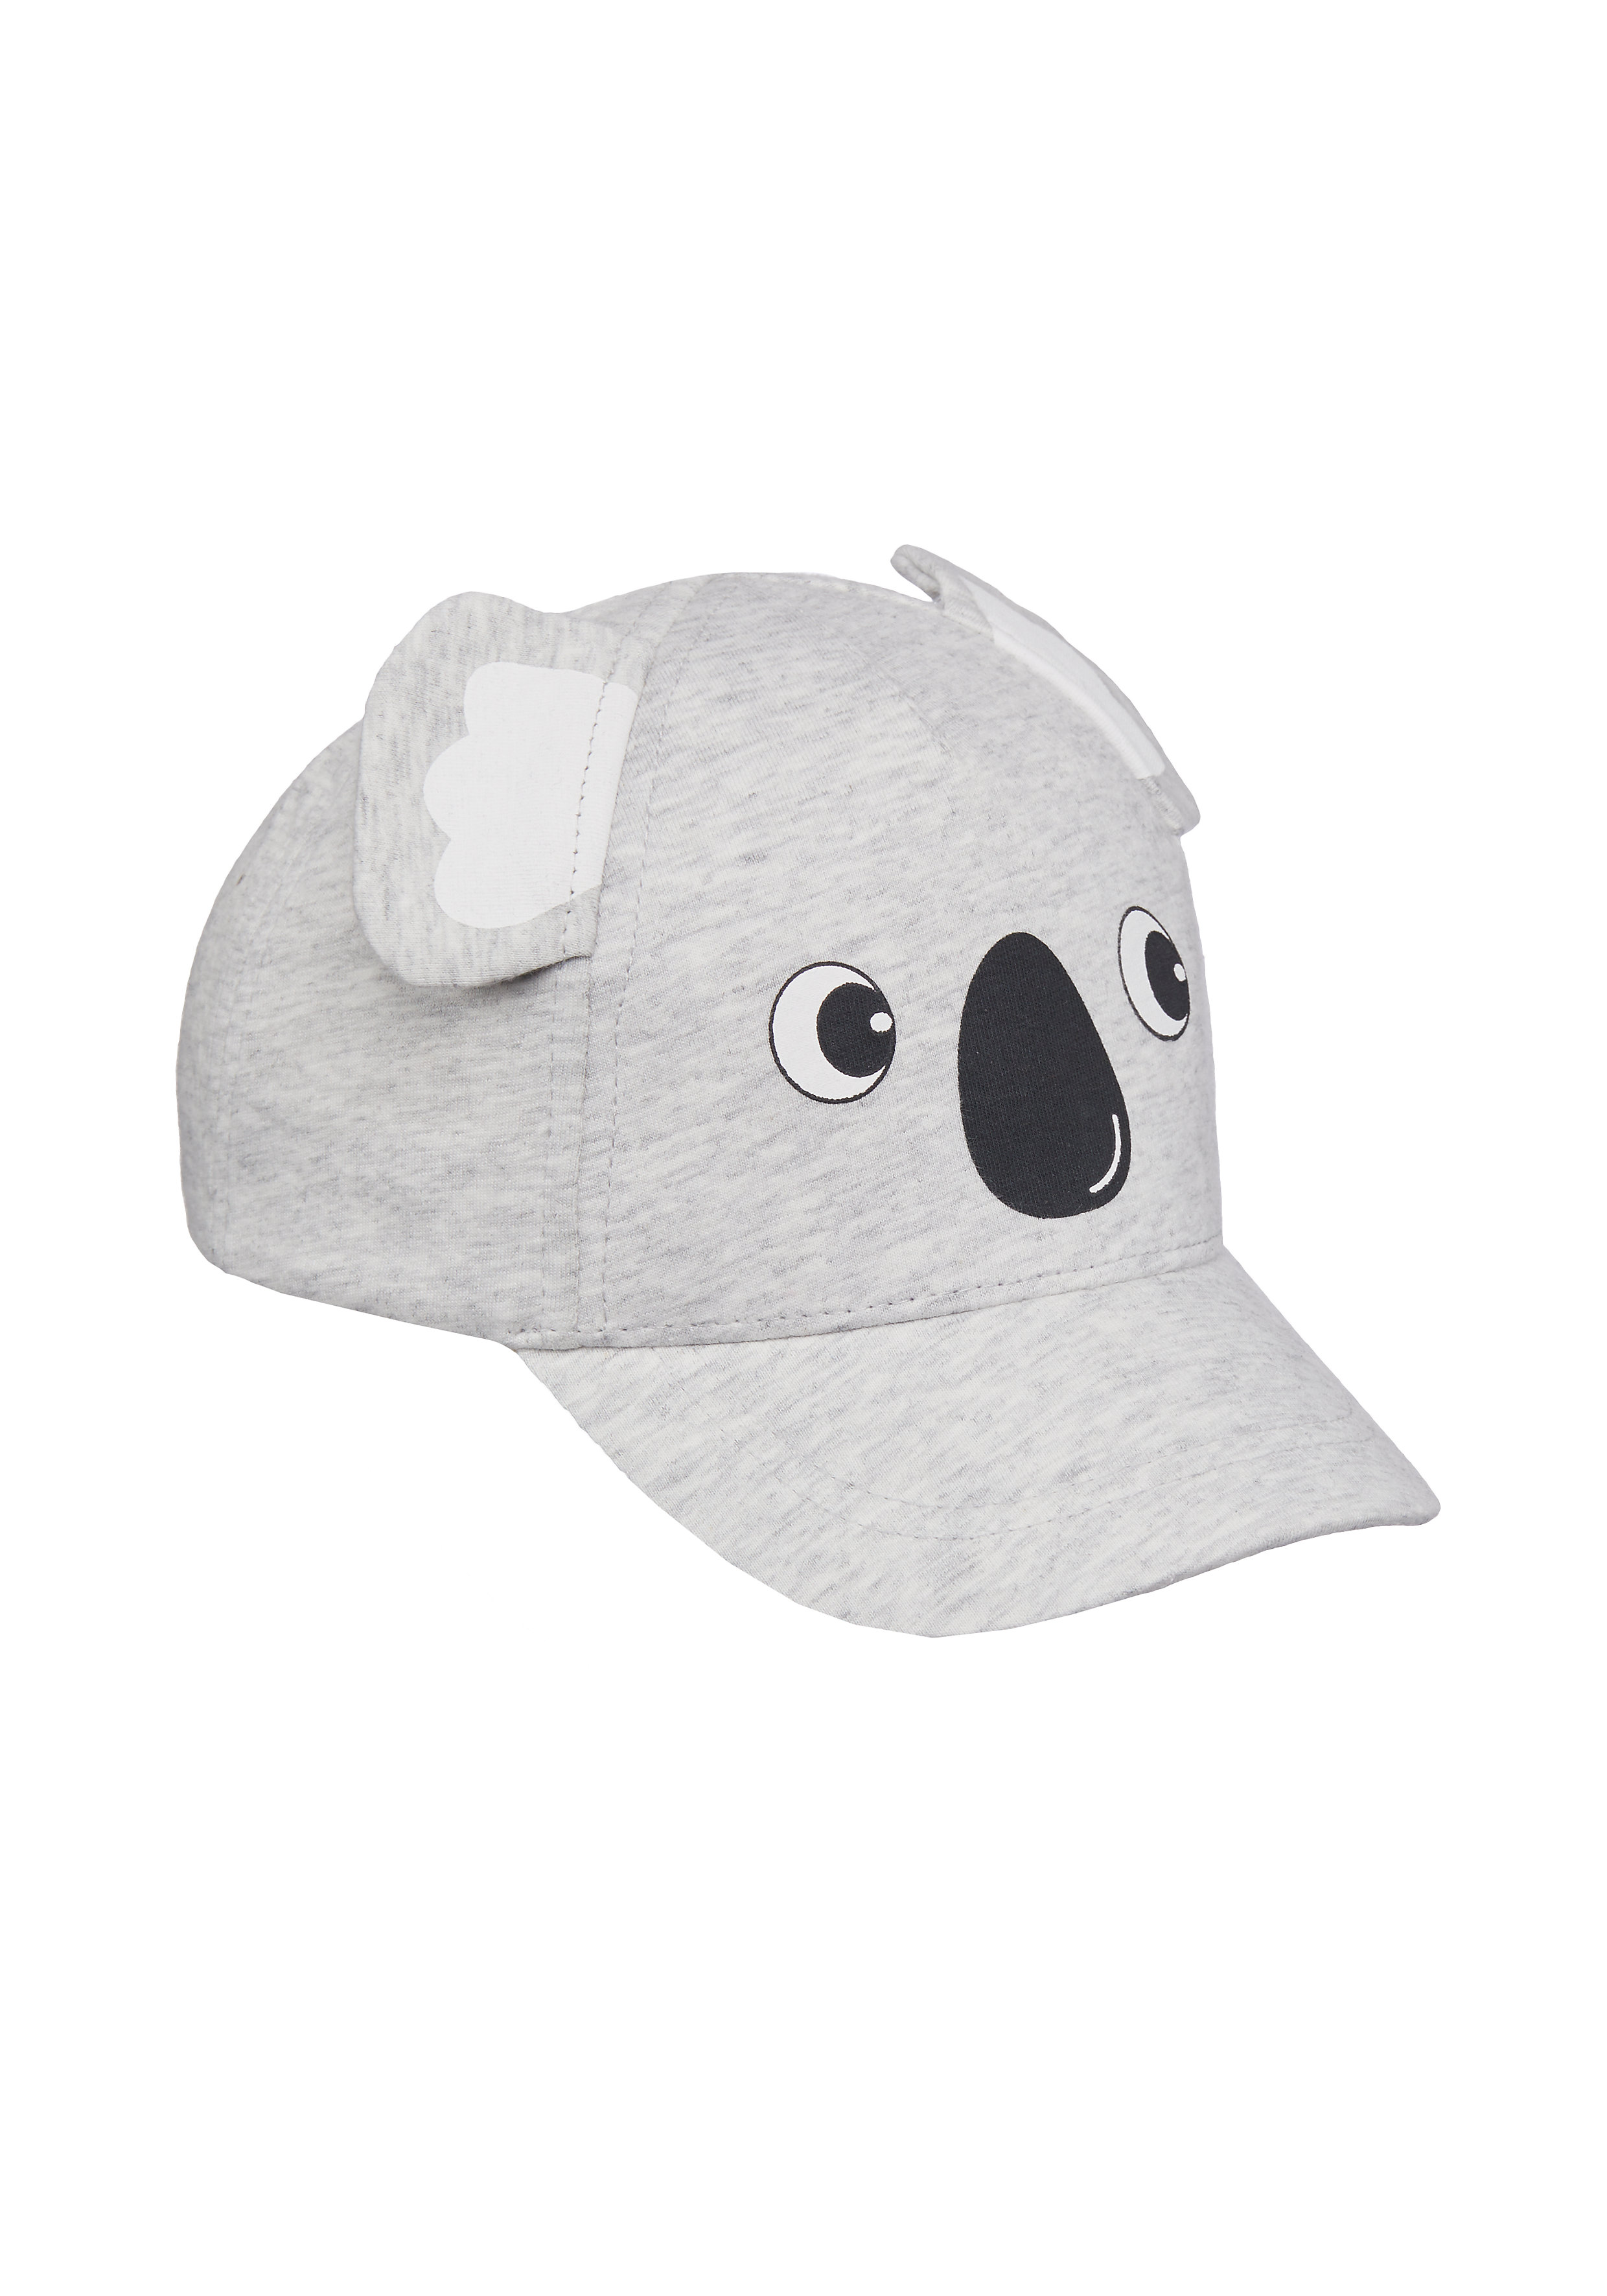 Mothercare | Girls Cap 3D Koala Ears - Grey